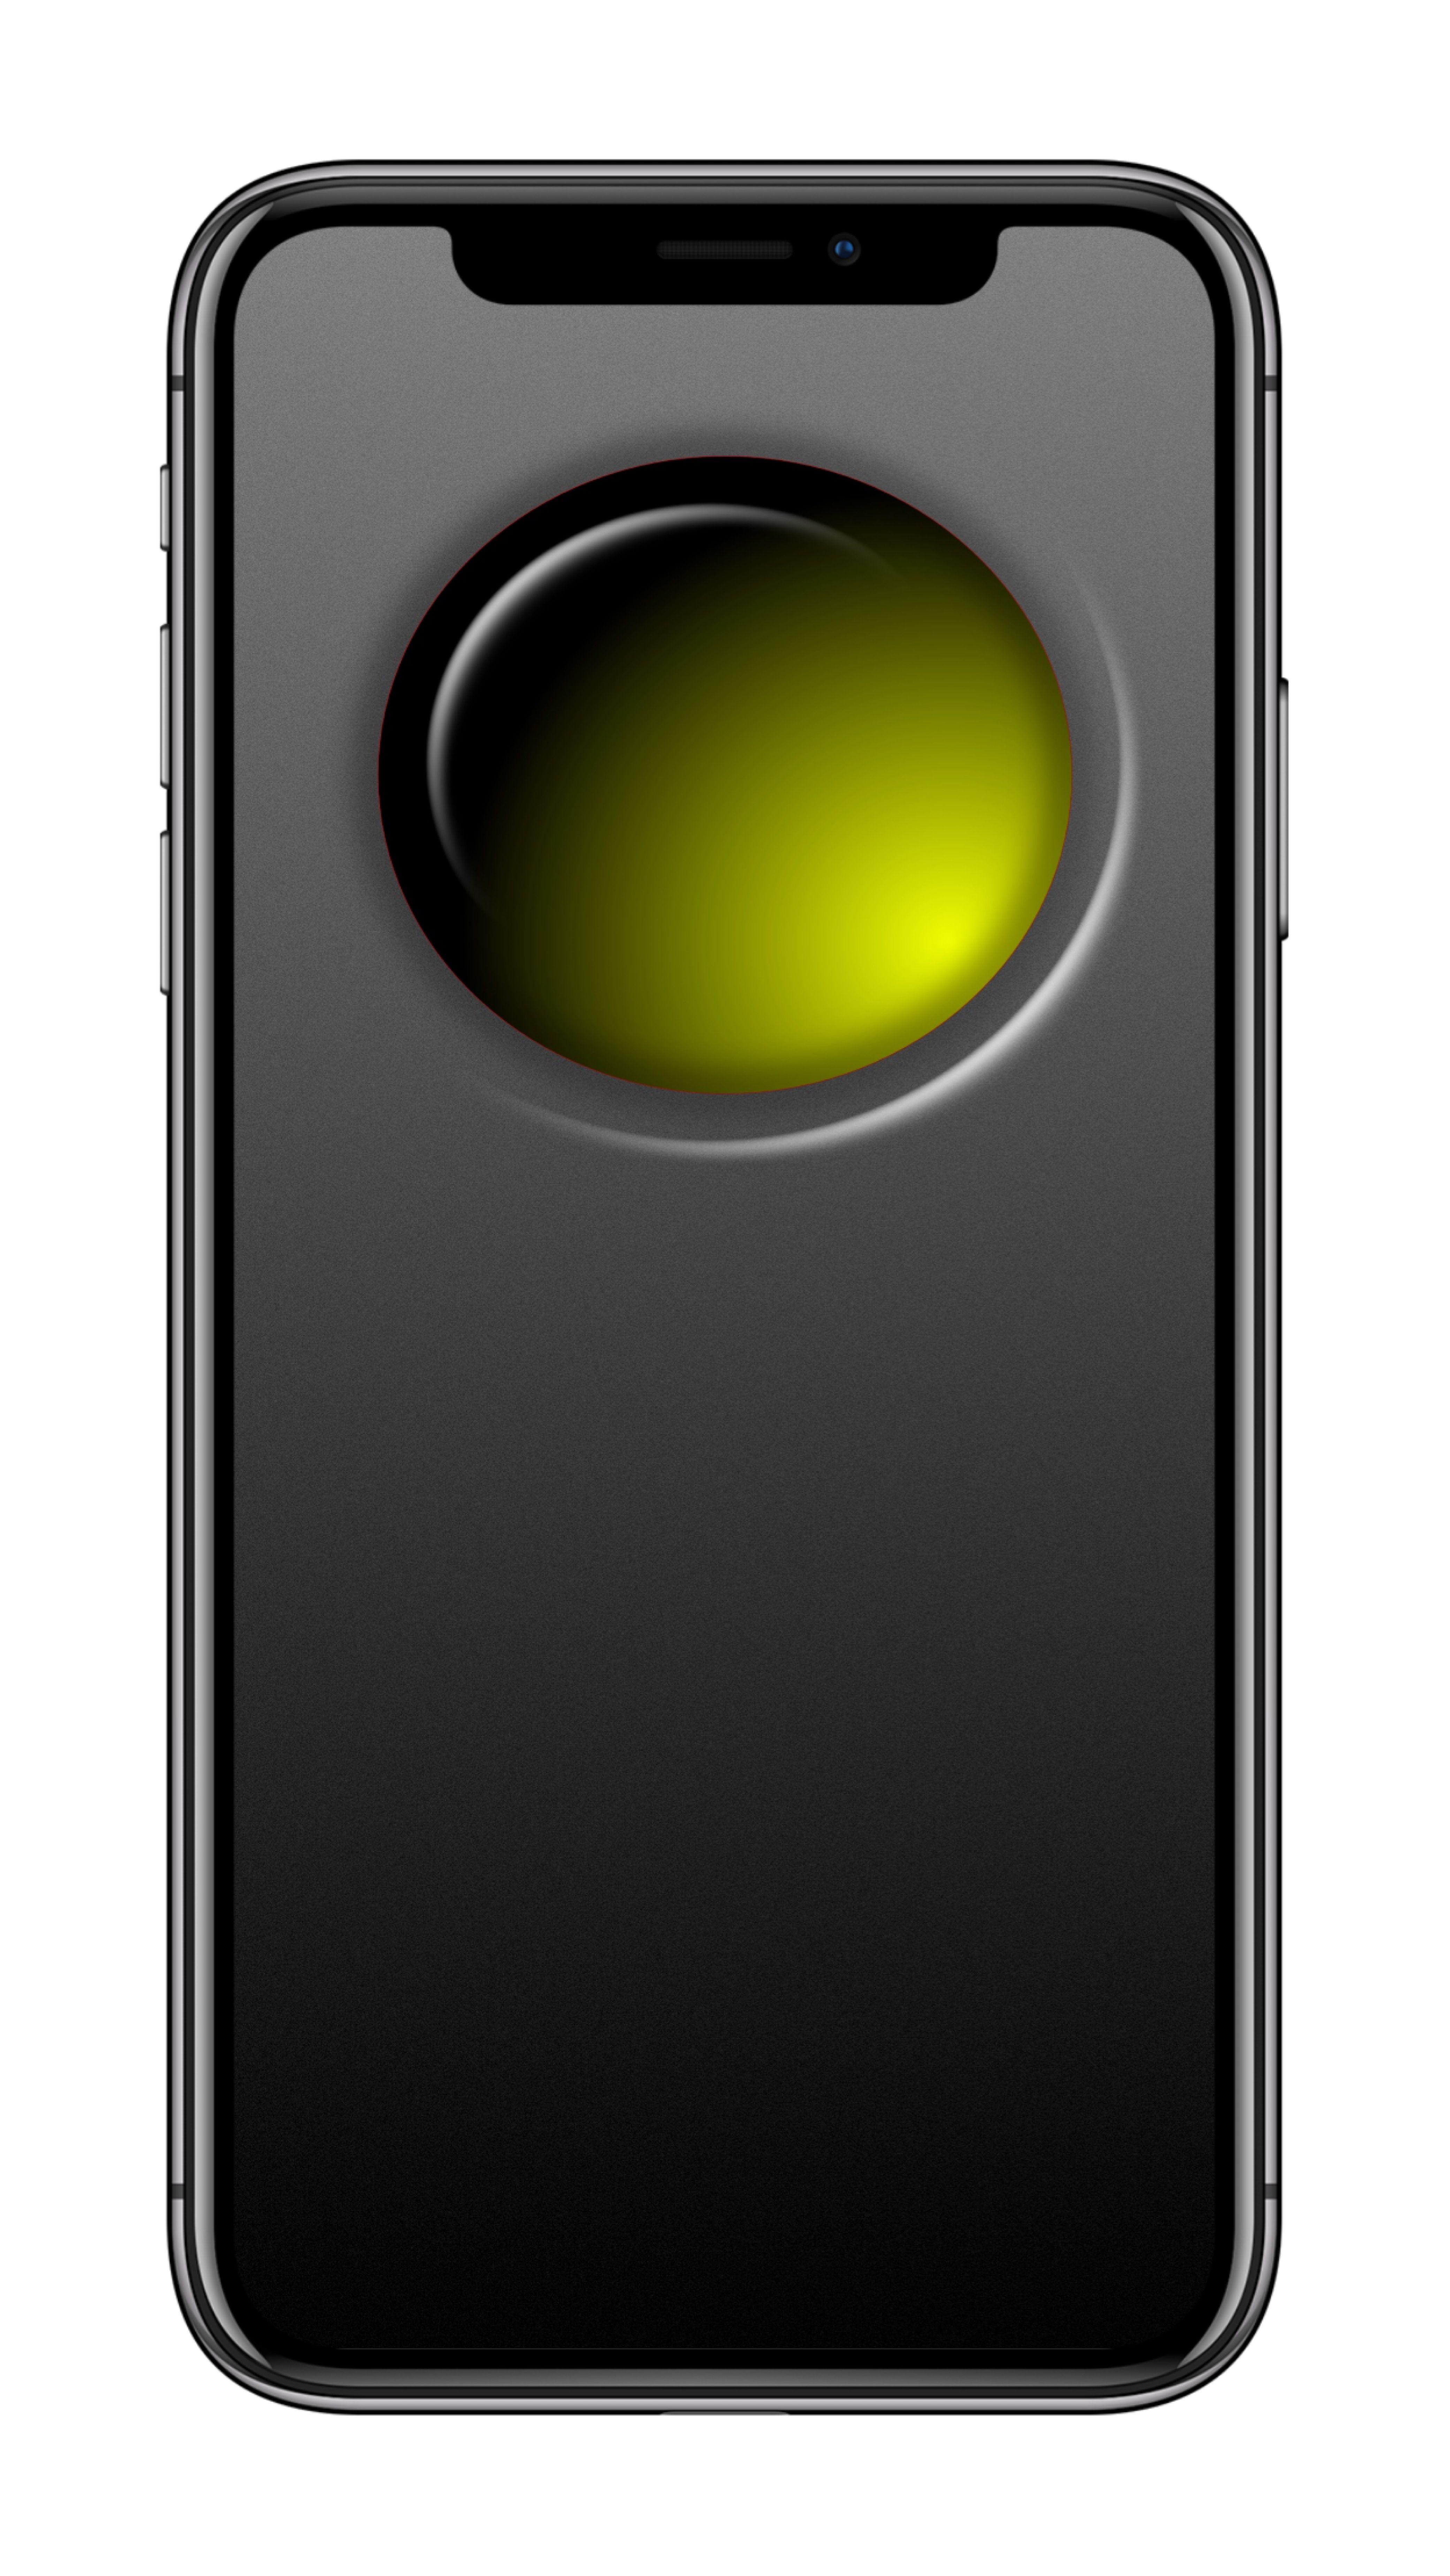 Phone Tablet Wallpaper Designed By Chotspot4u Iphone